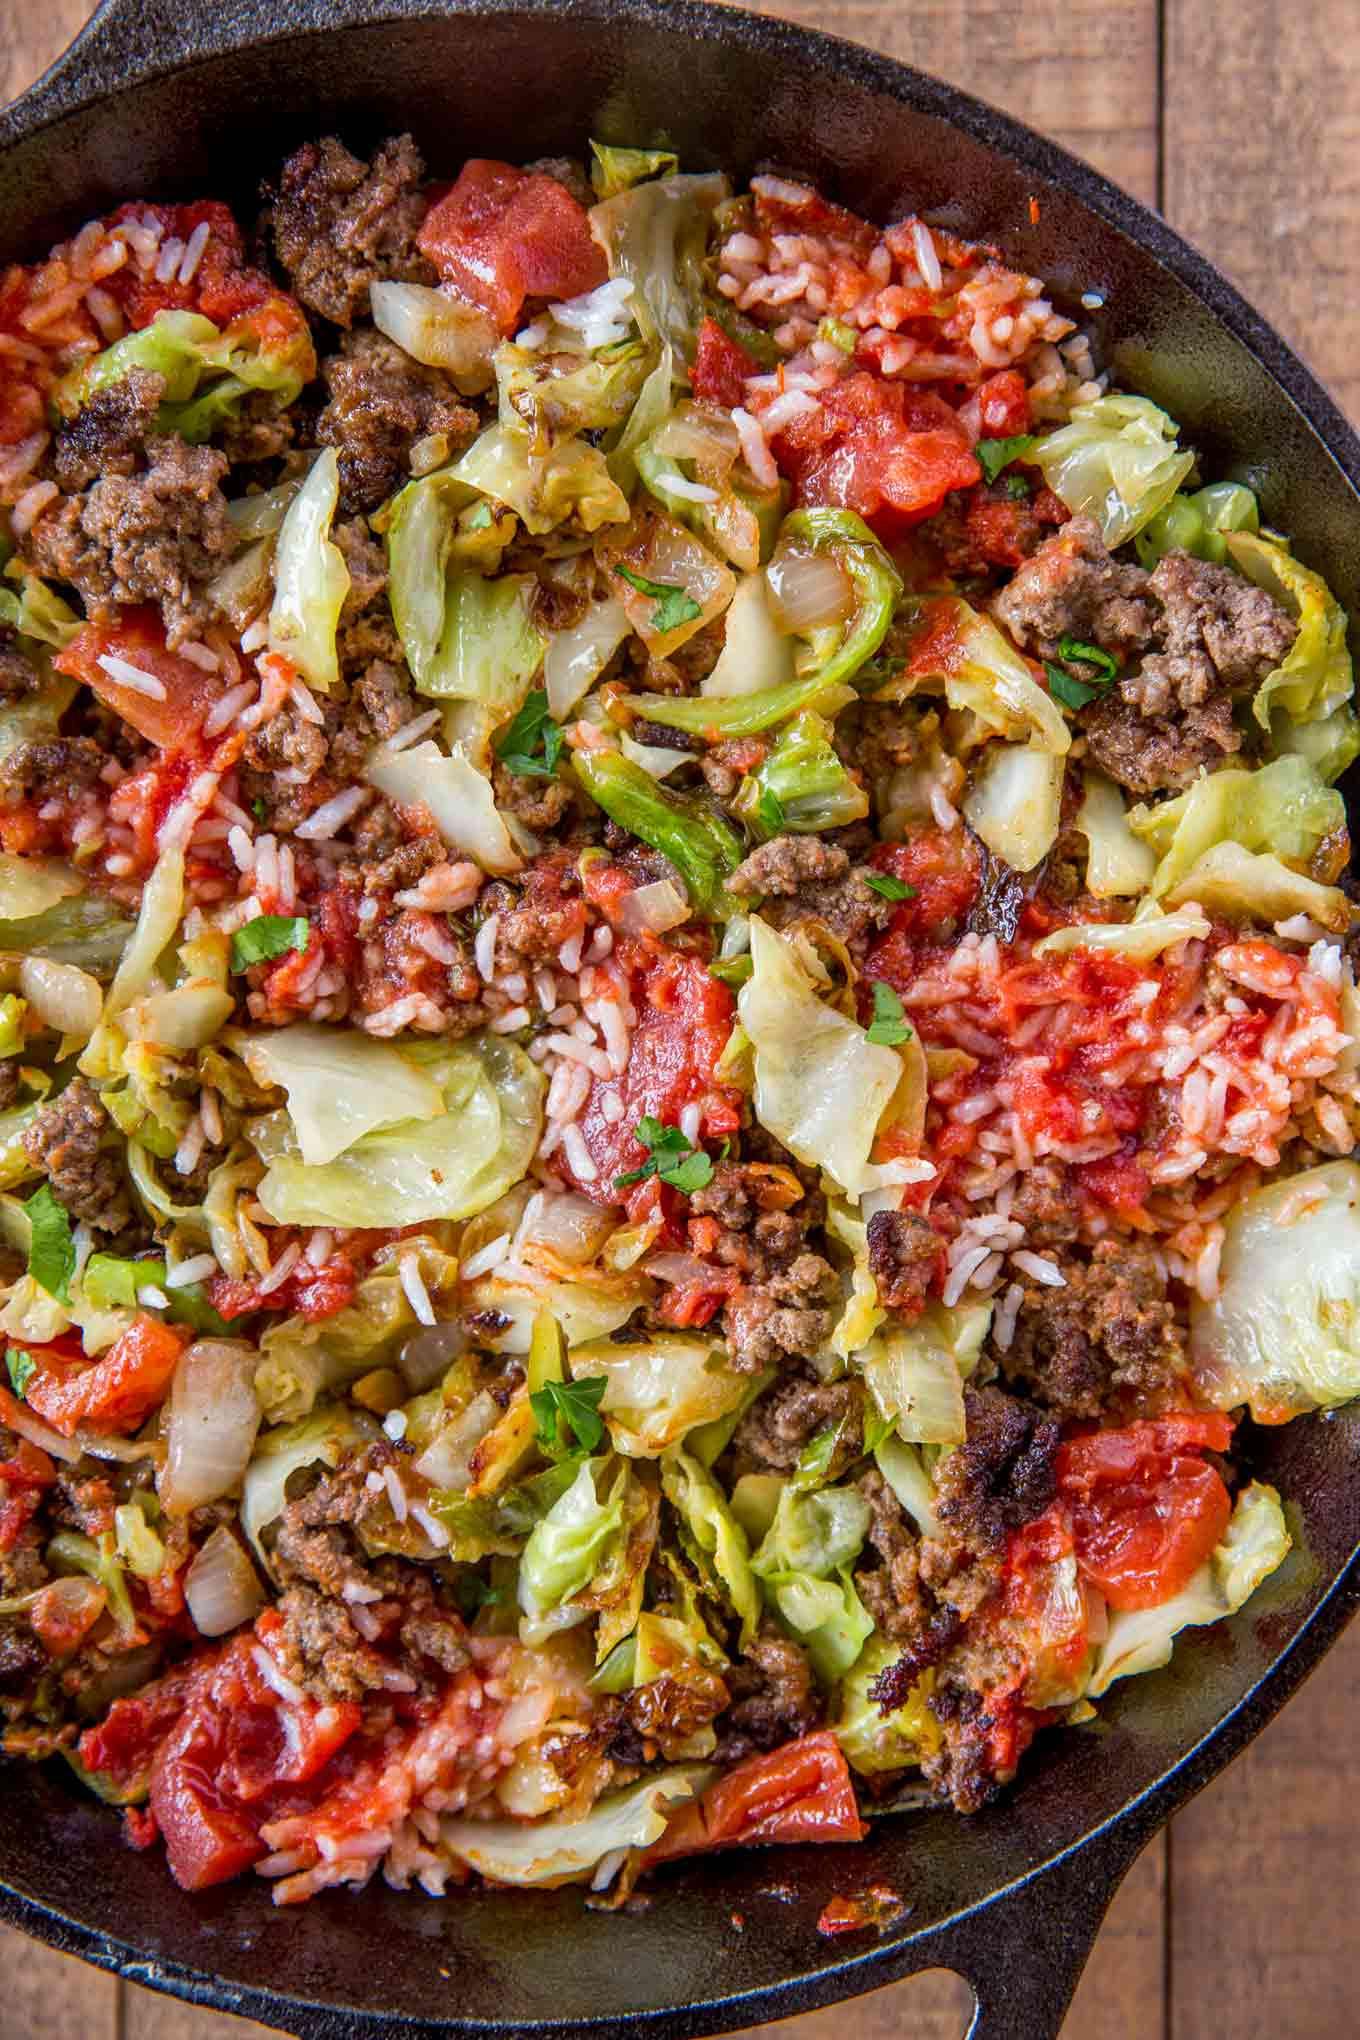 Cabbage Casserole Recipes  Stuffed Cabbage Casserole Dinner then Dessert